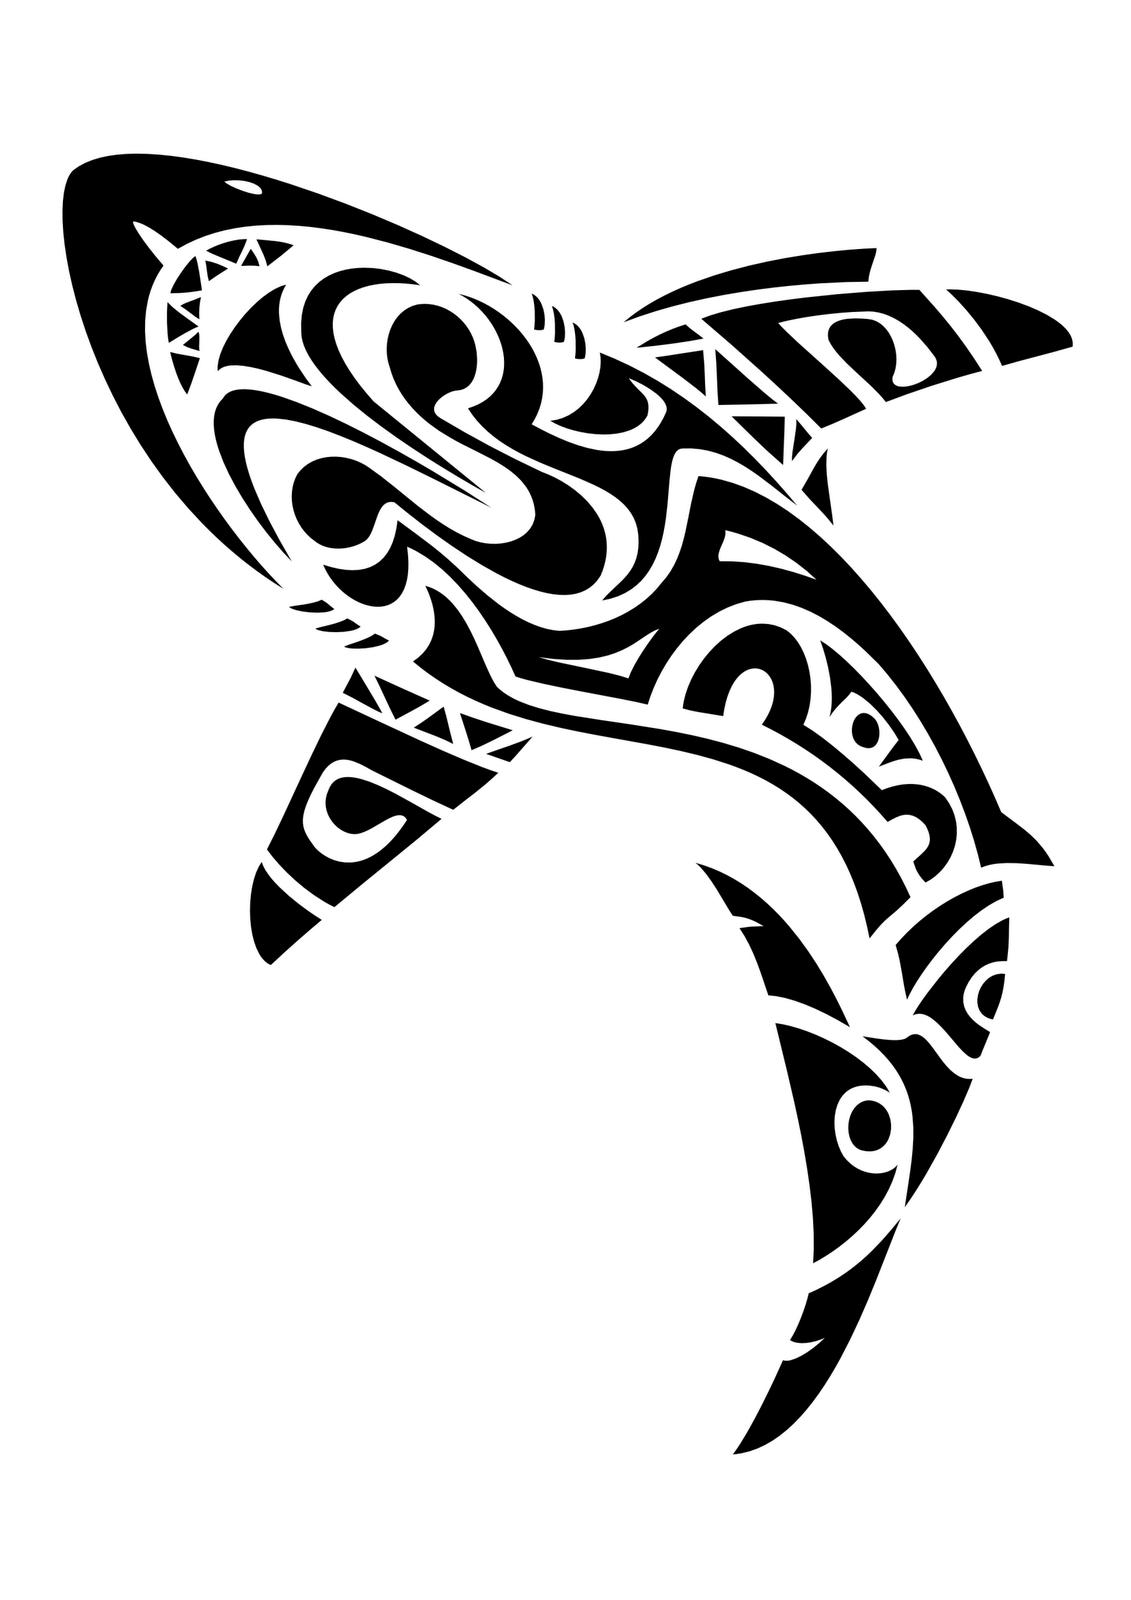 Maori Tattoo Meanings And Symbols: Maori Tattoo Symbols And Meanings